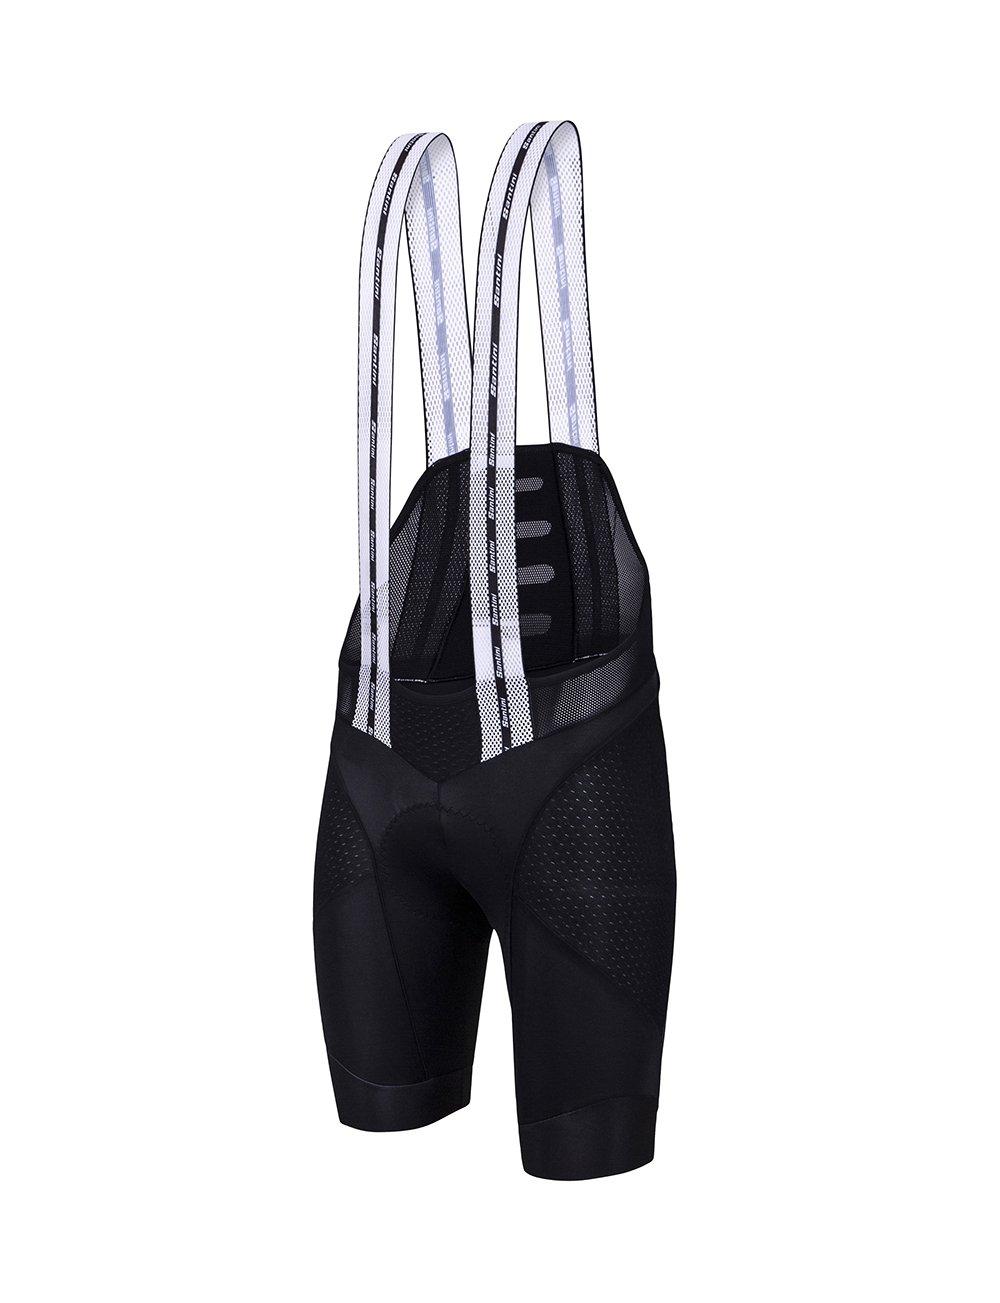 Santini BCool Bib Shorts – Men 's B019HPFDEQ Small|ブラック ブラック Small